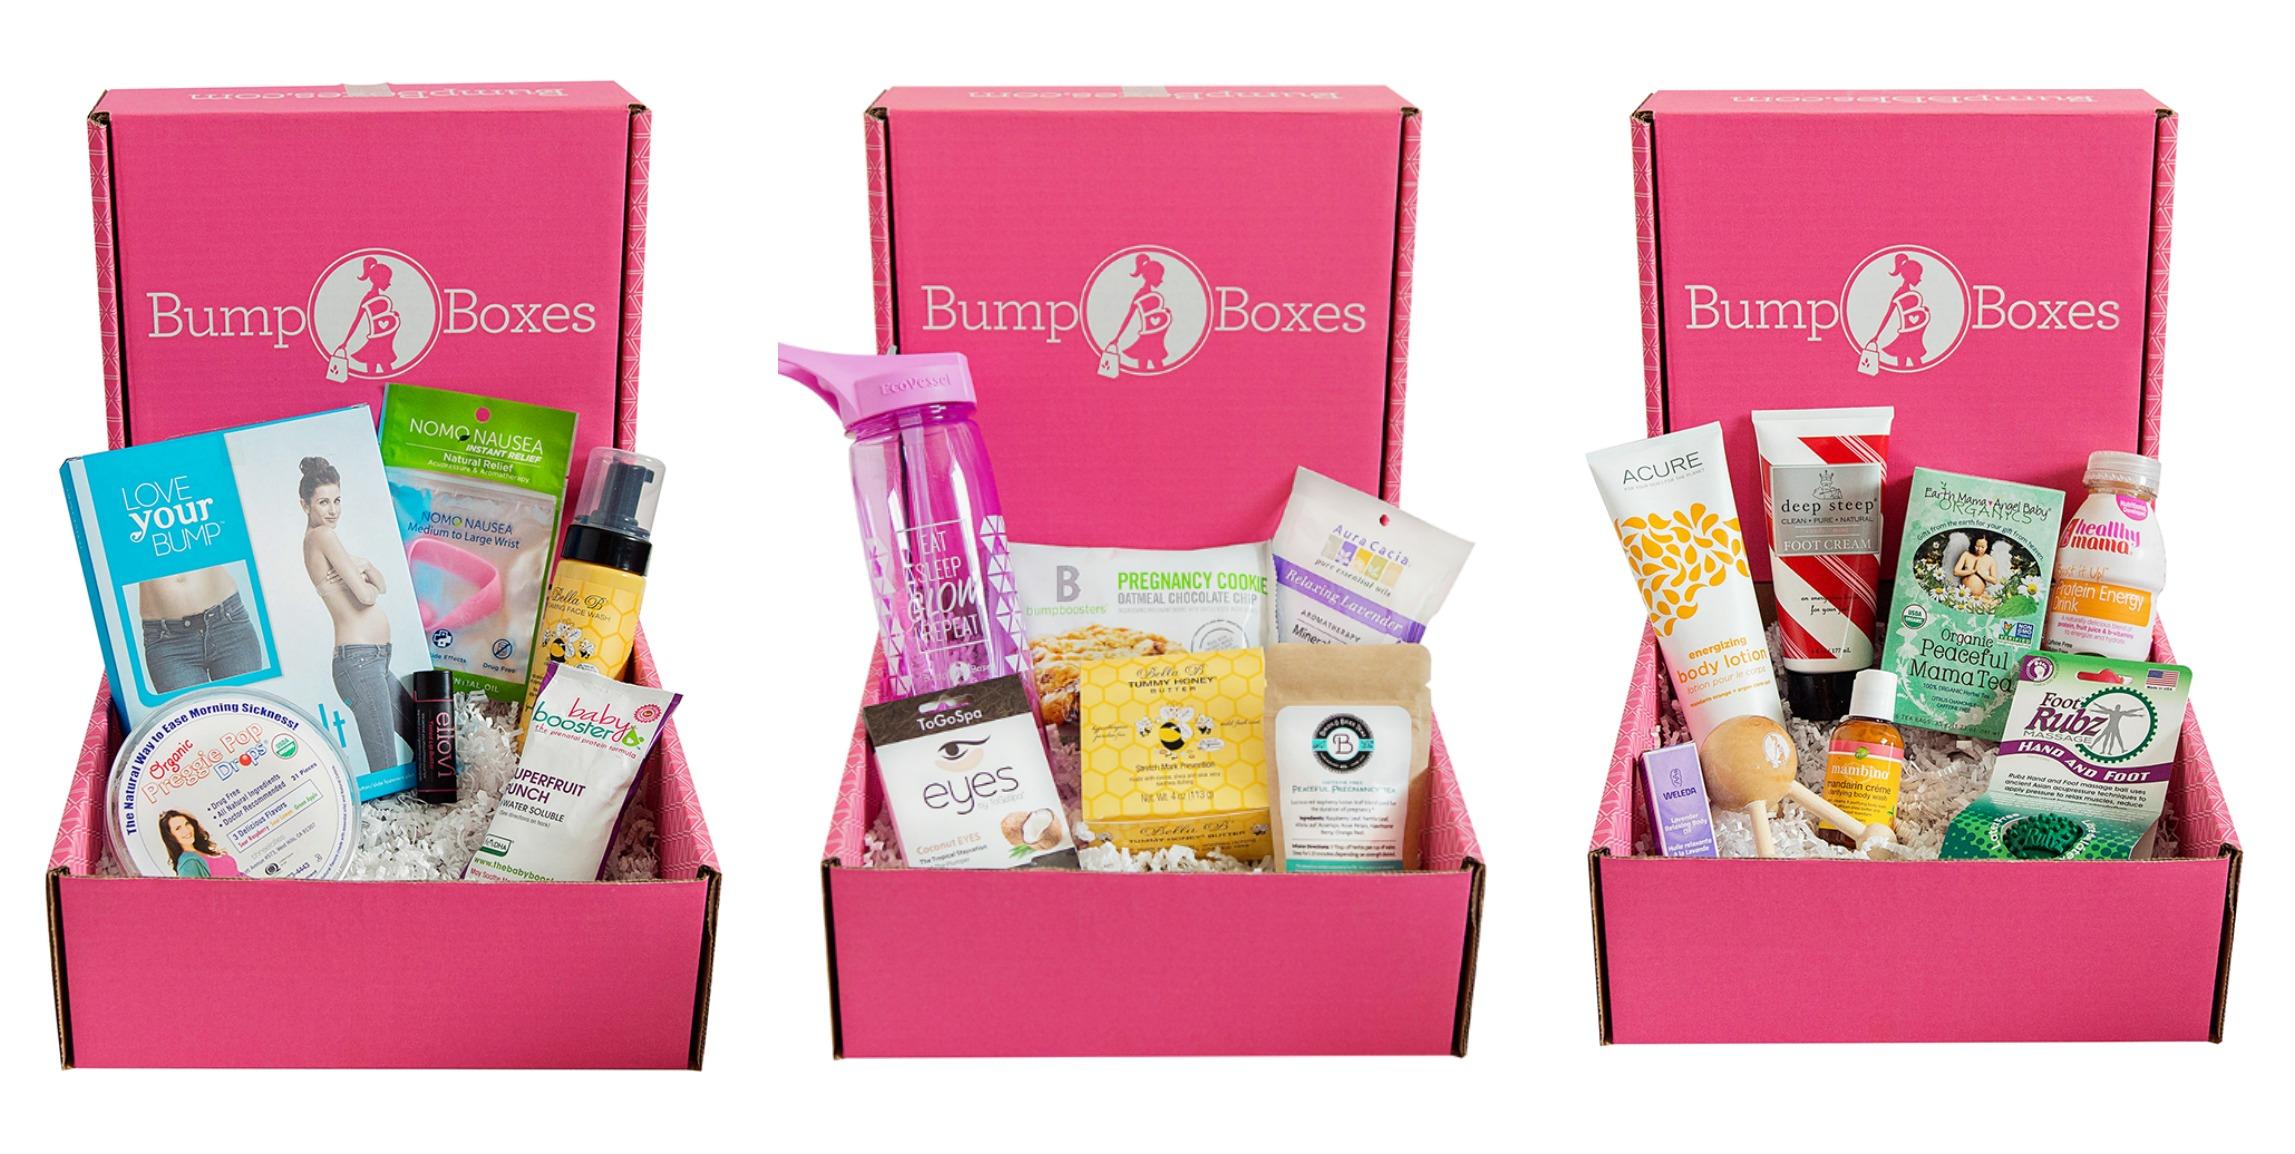 bumpboxes